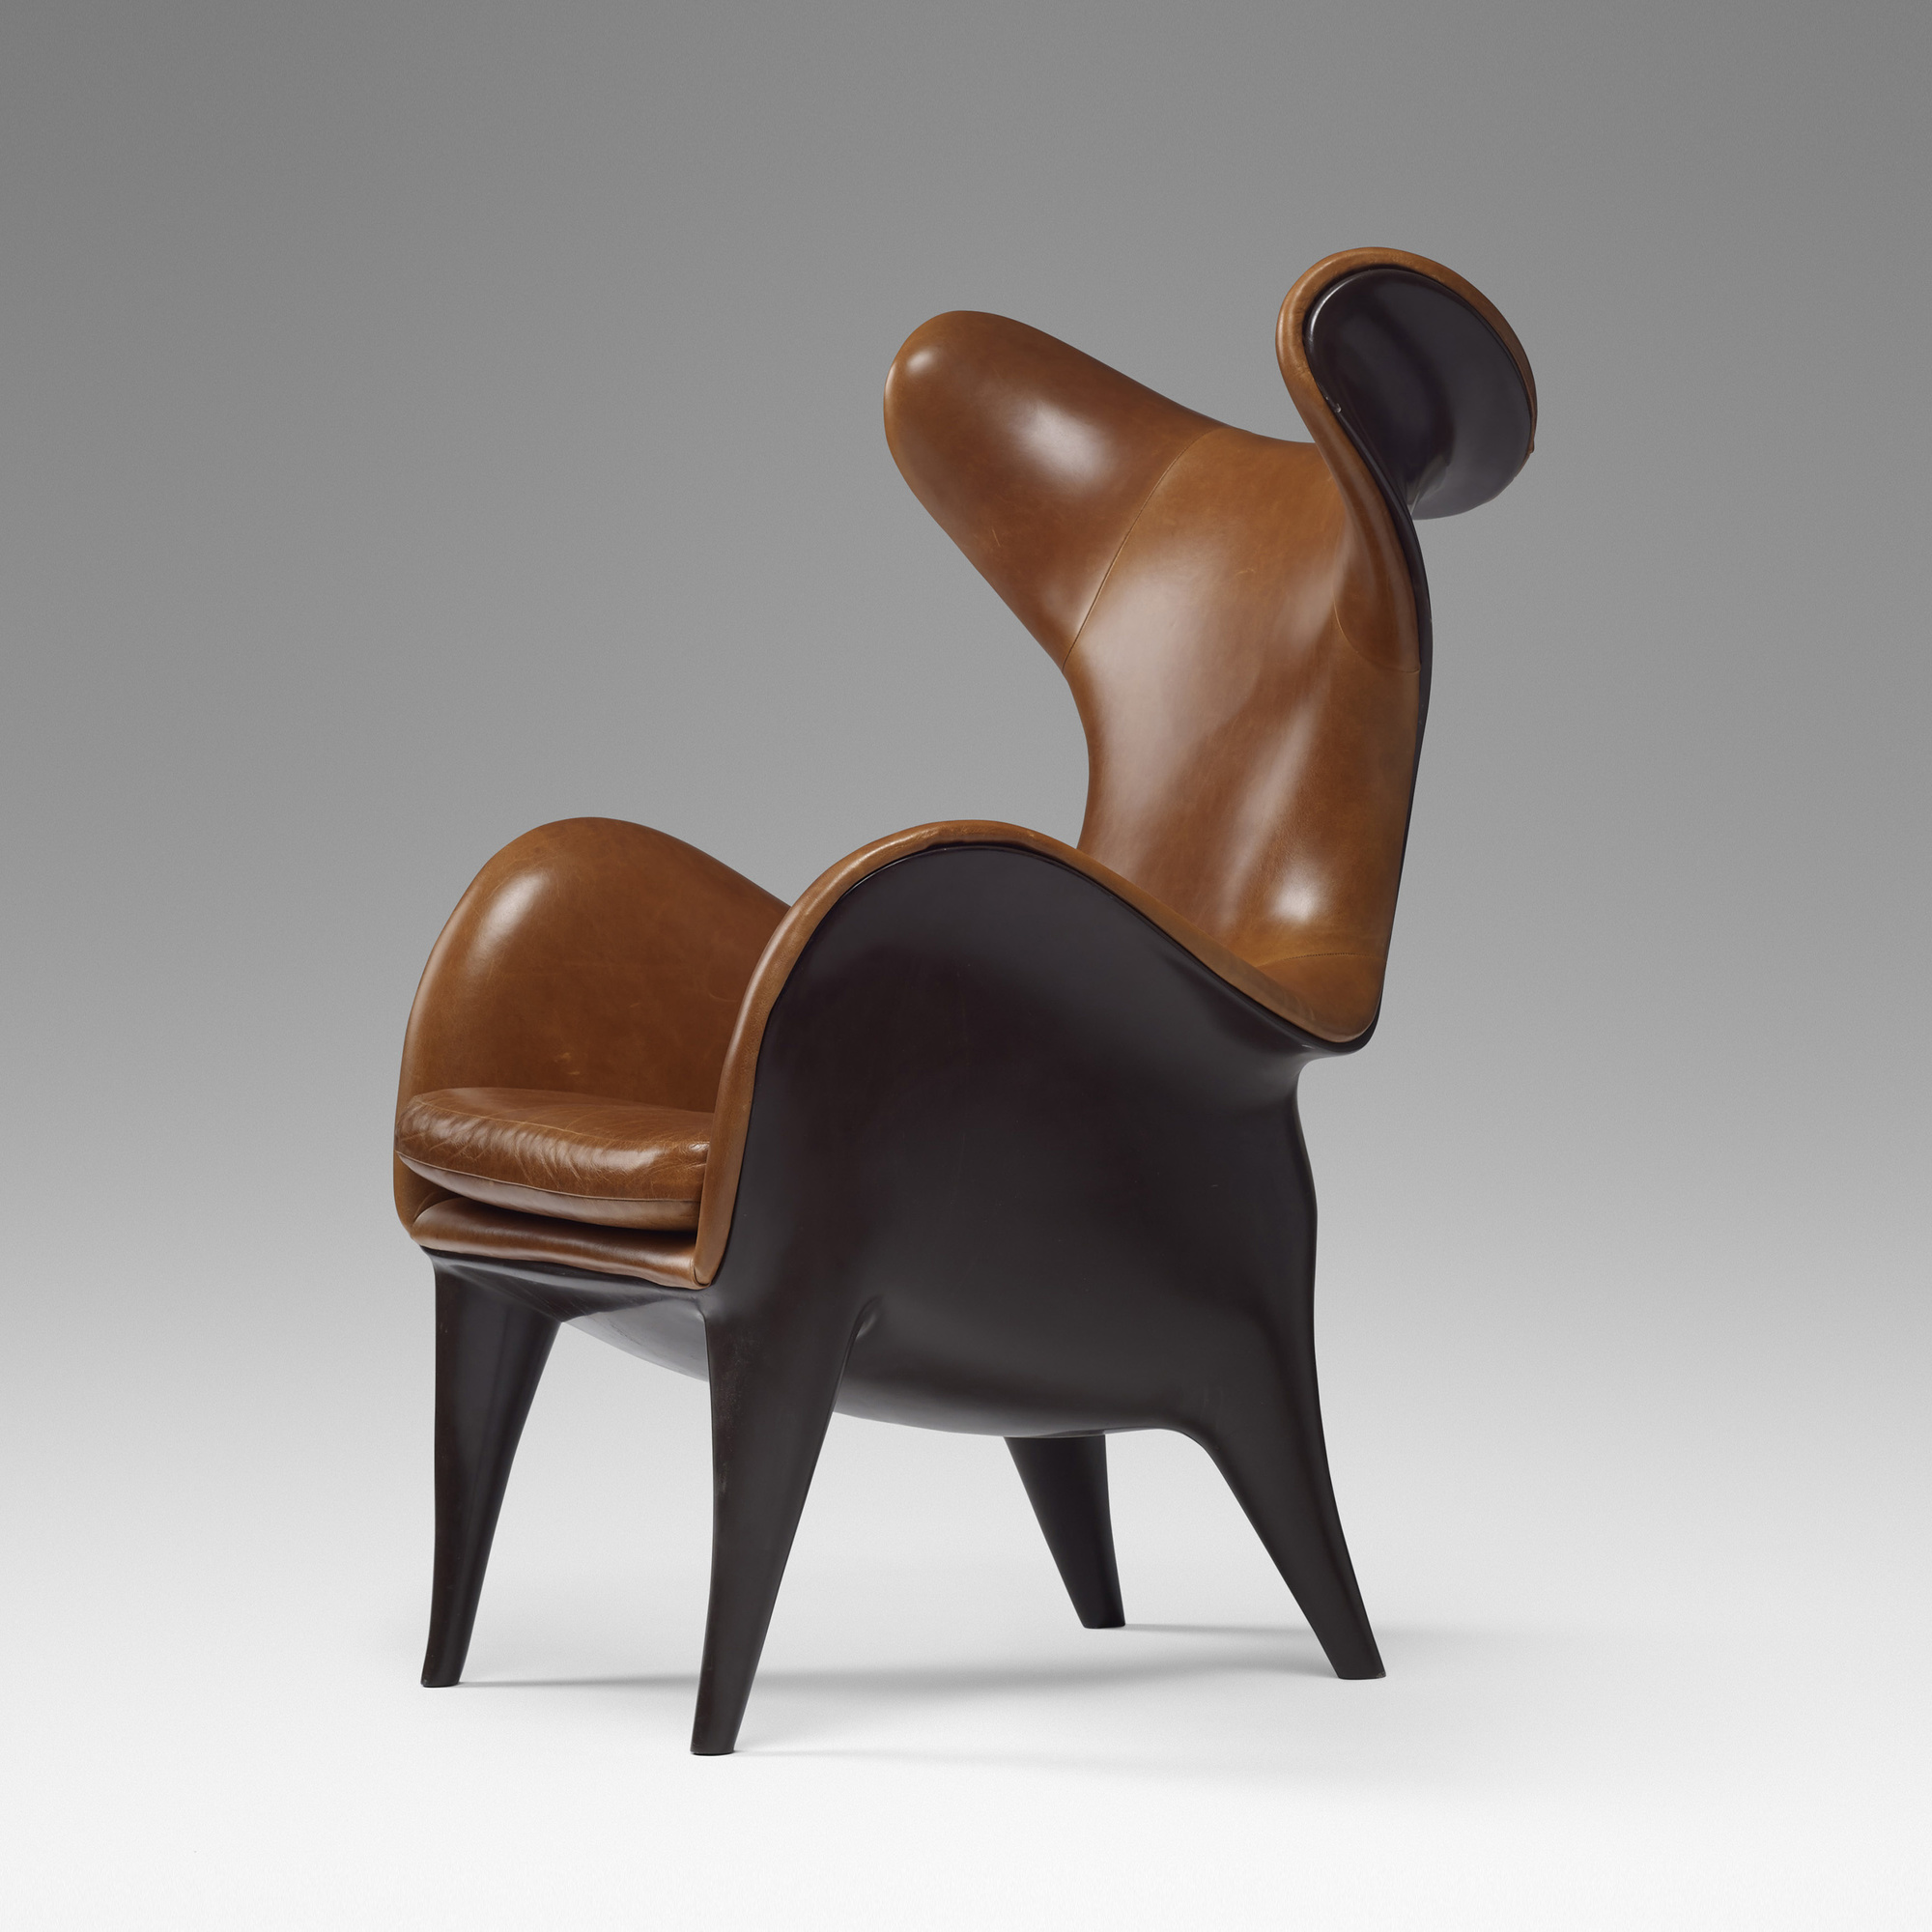 152: Jordan Mozer / Frankie Chair (1 Of 4)